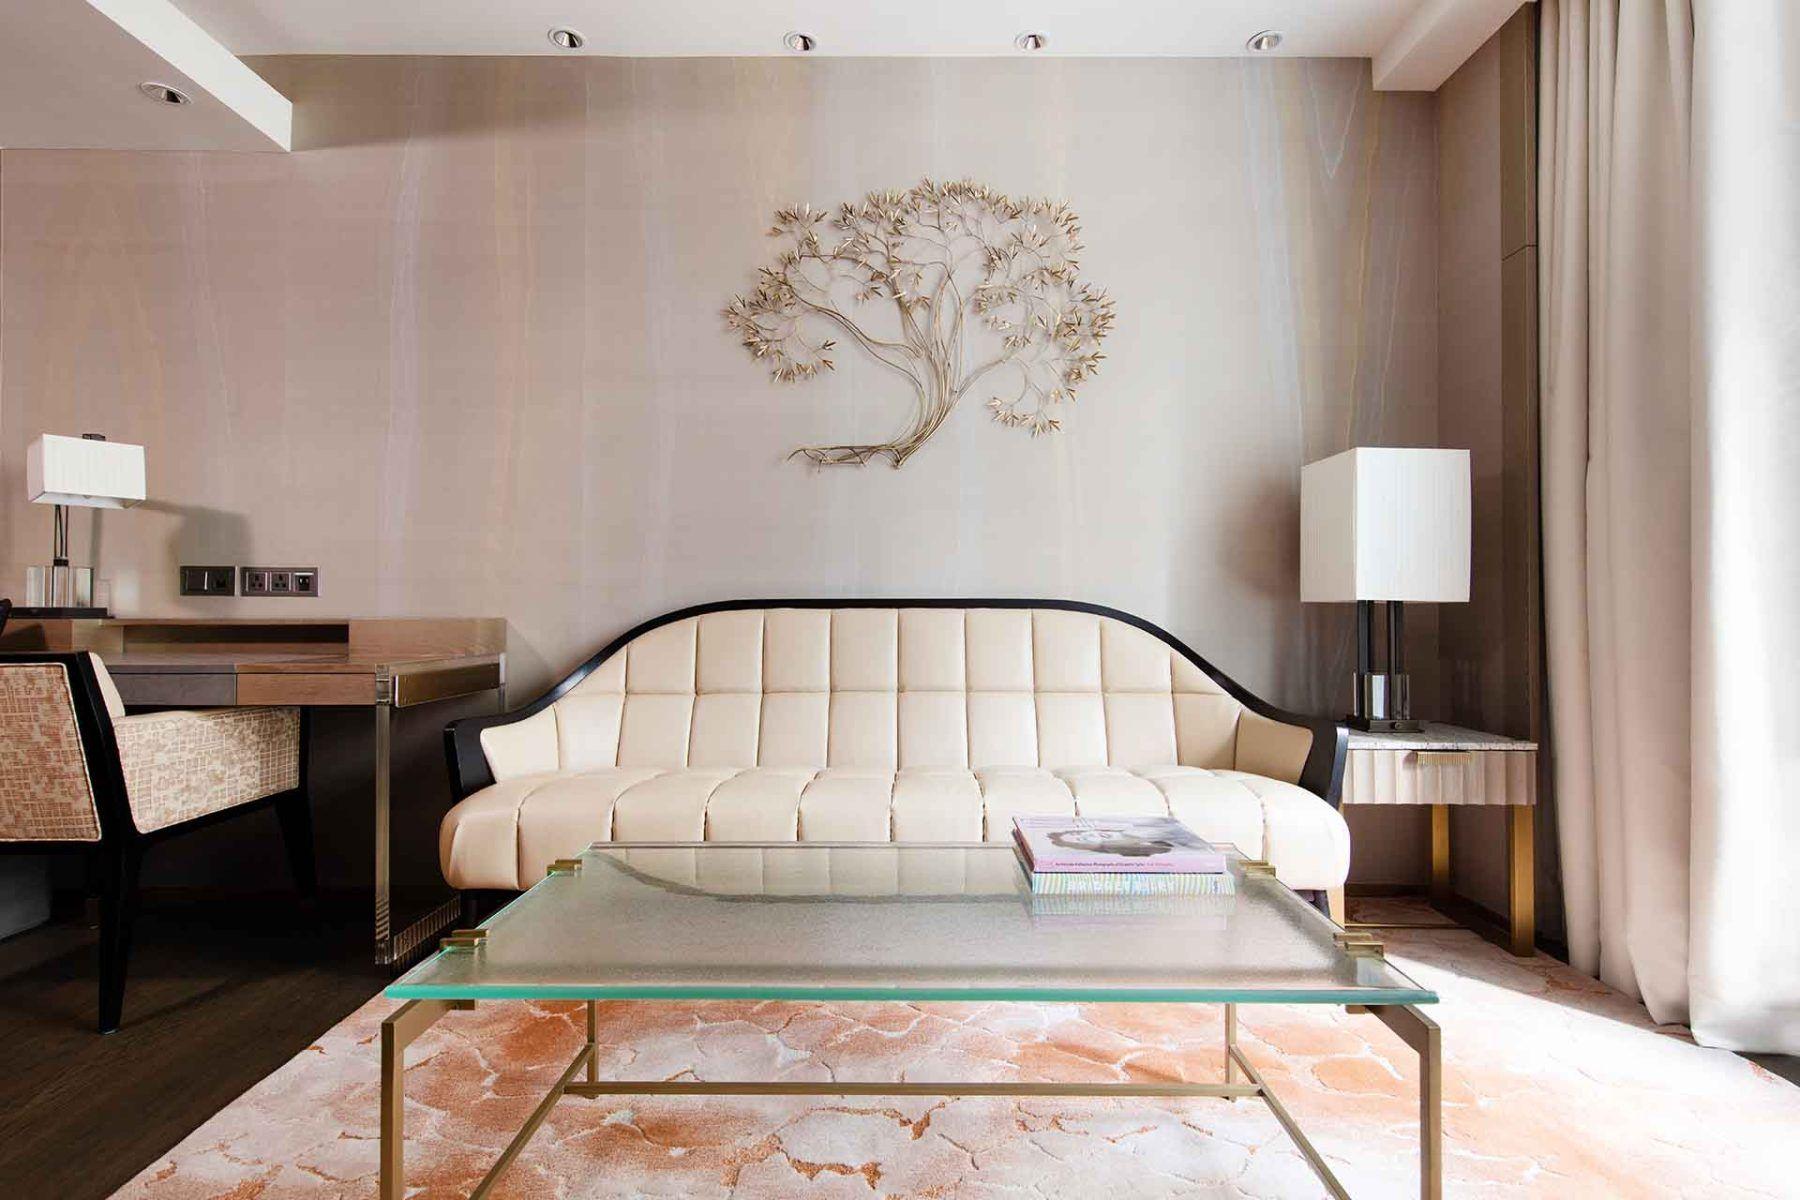 Joyce Wang Studio Based In London And Hong Kong Is An Award Winning Design HotelRestaurant